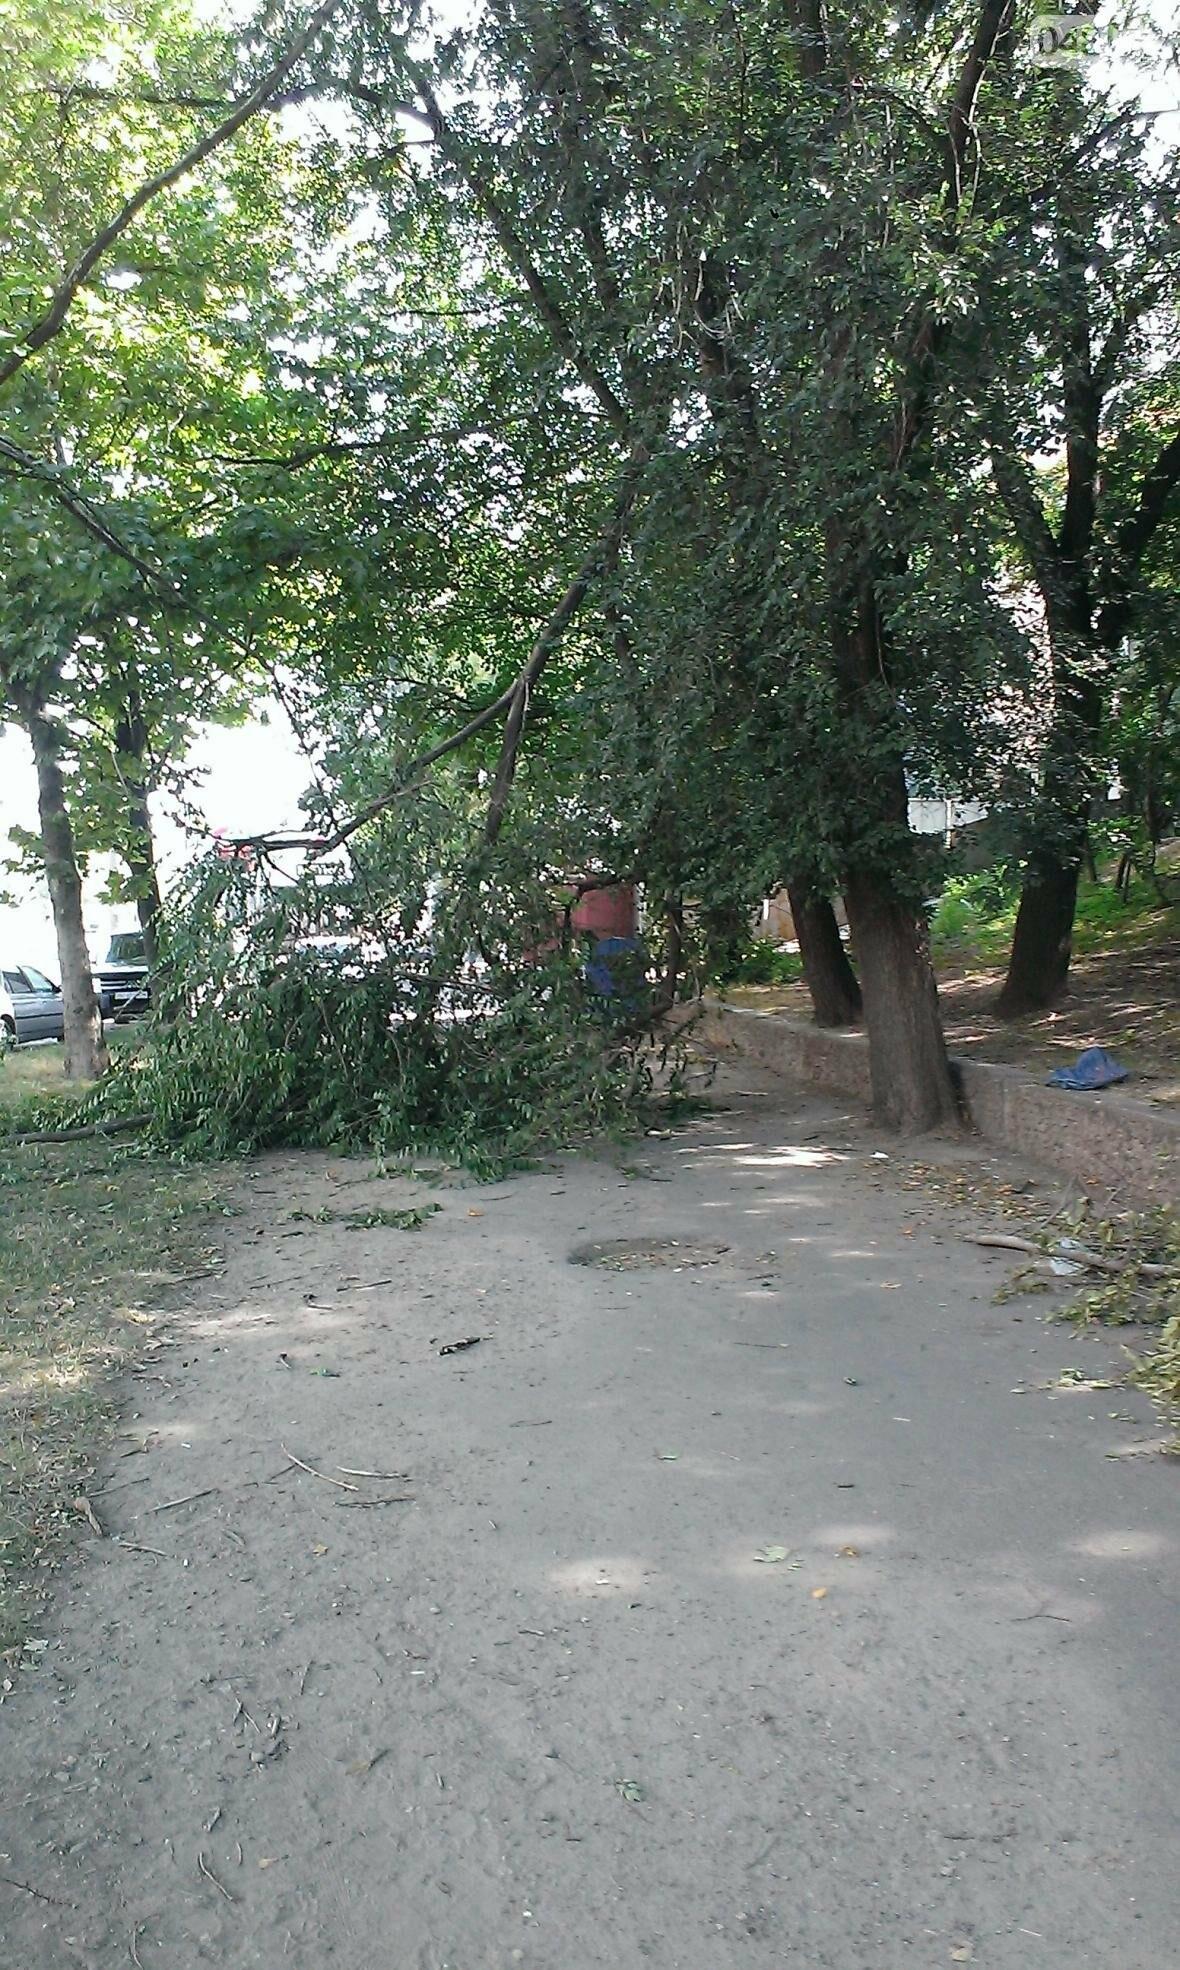 На Балковской ураган поломал дерево: ветка перегородила одесситам тротуар (ФОТО), фото-1